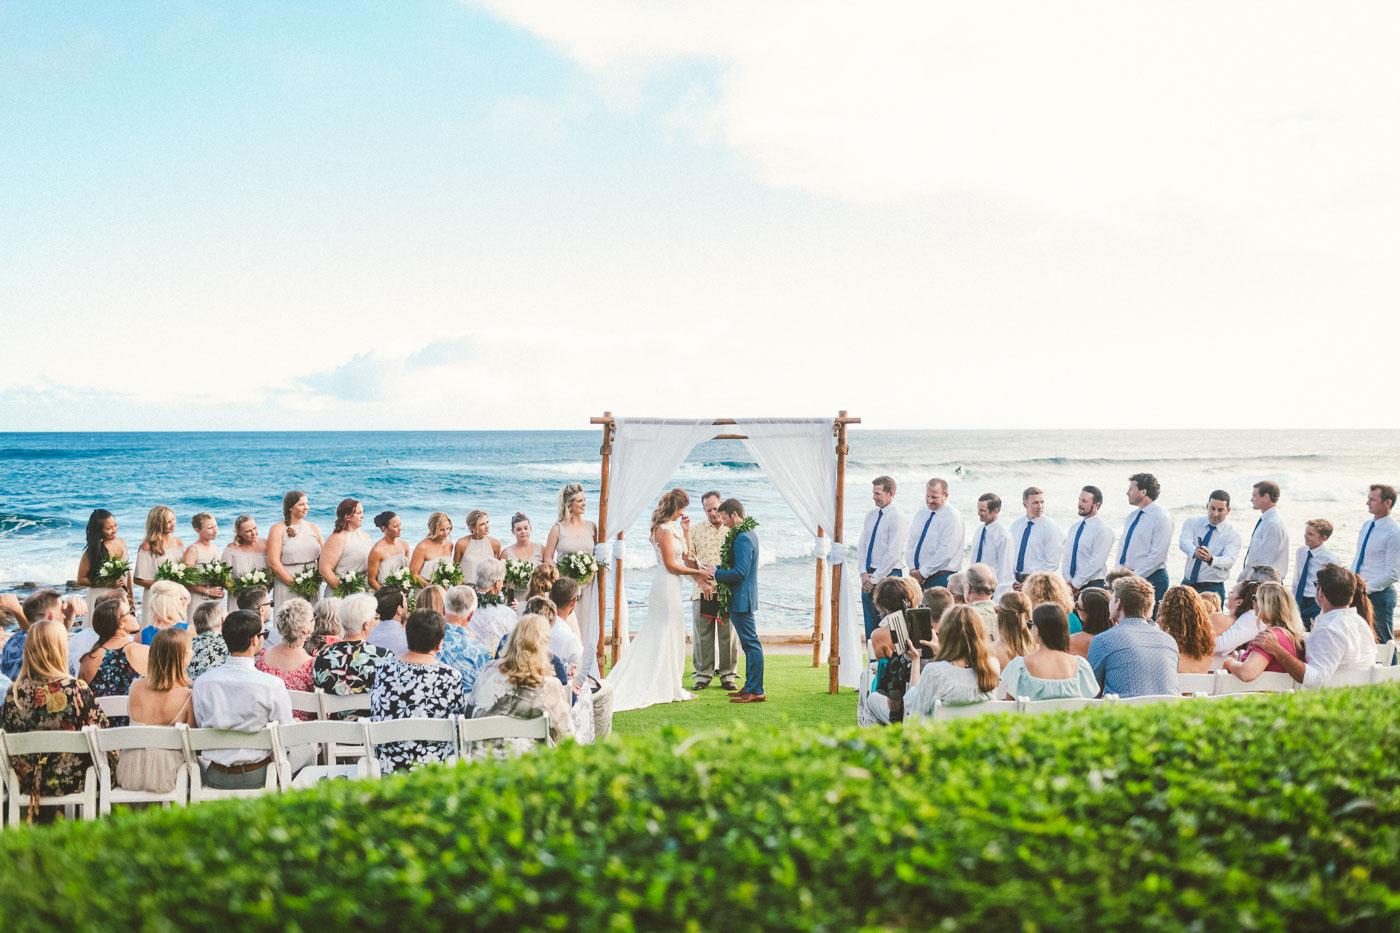 maui wedding photographer_140.jpg